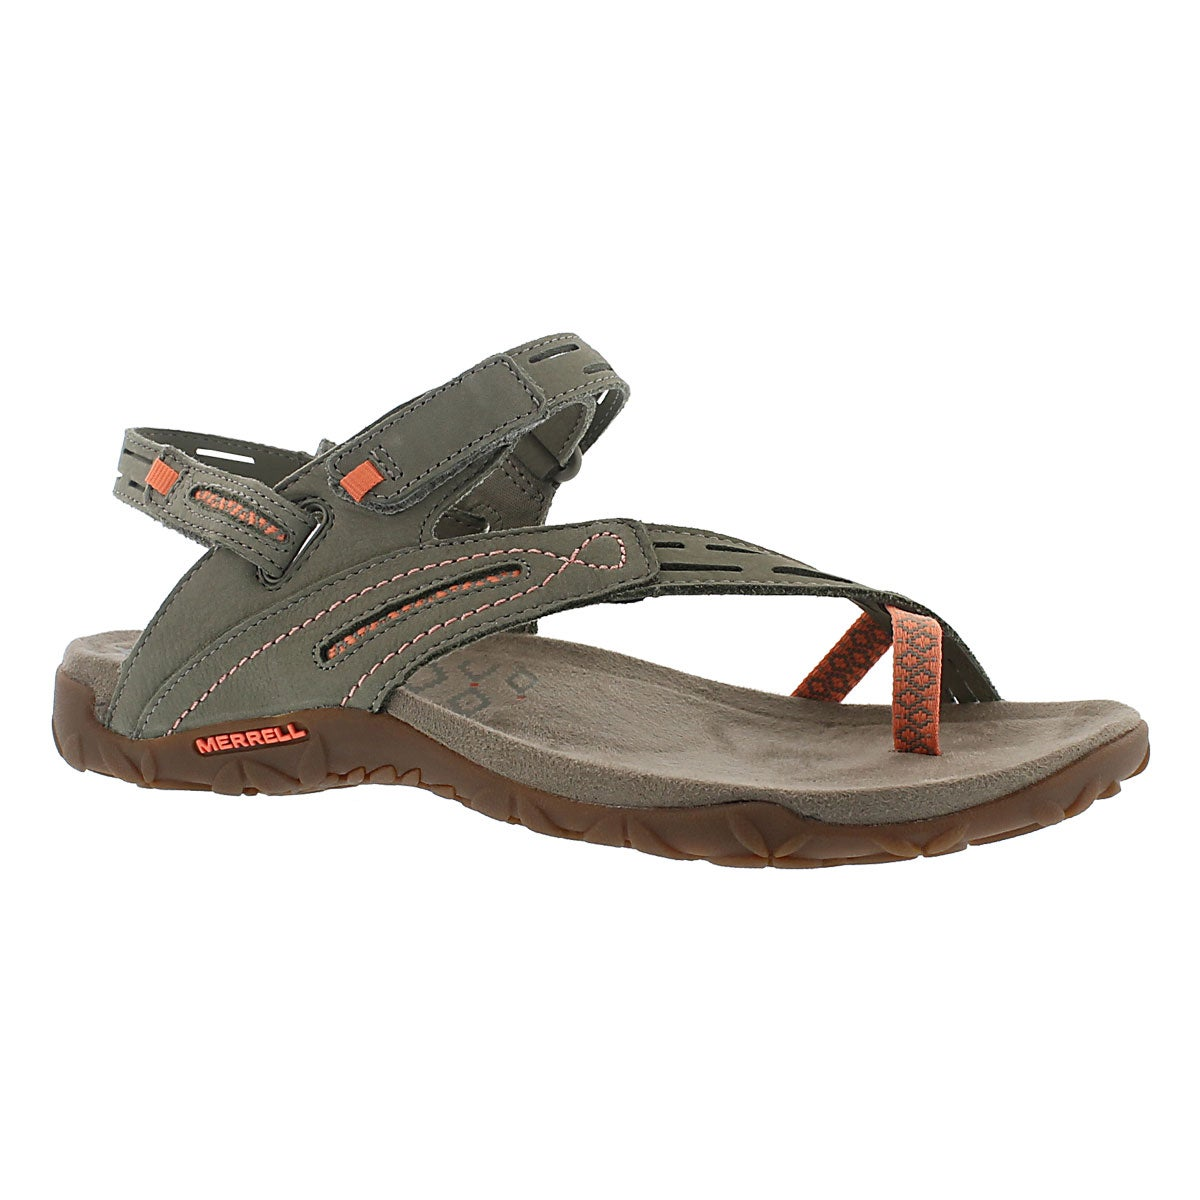 Women's TERRAN CONVERTIBLE II putty sandals